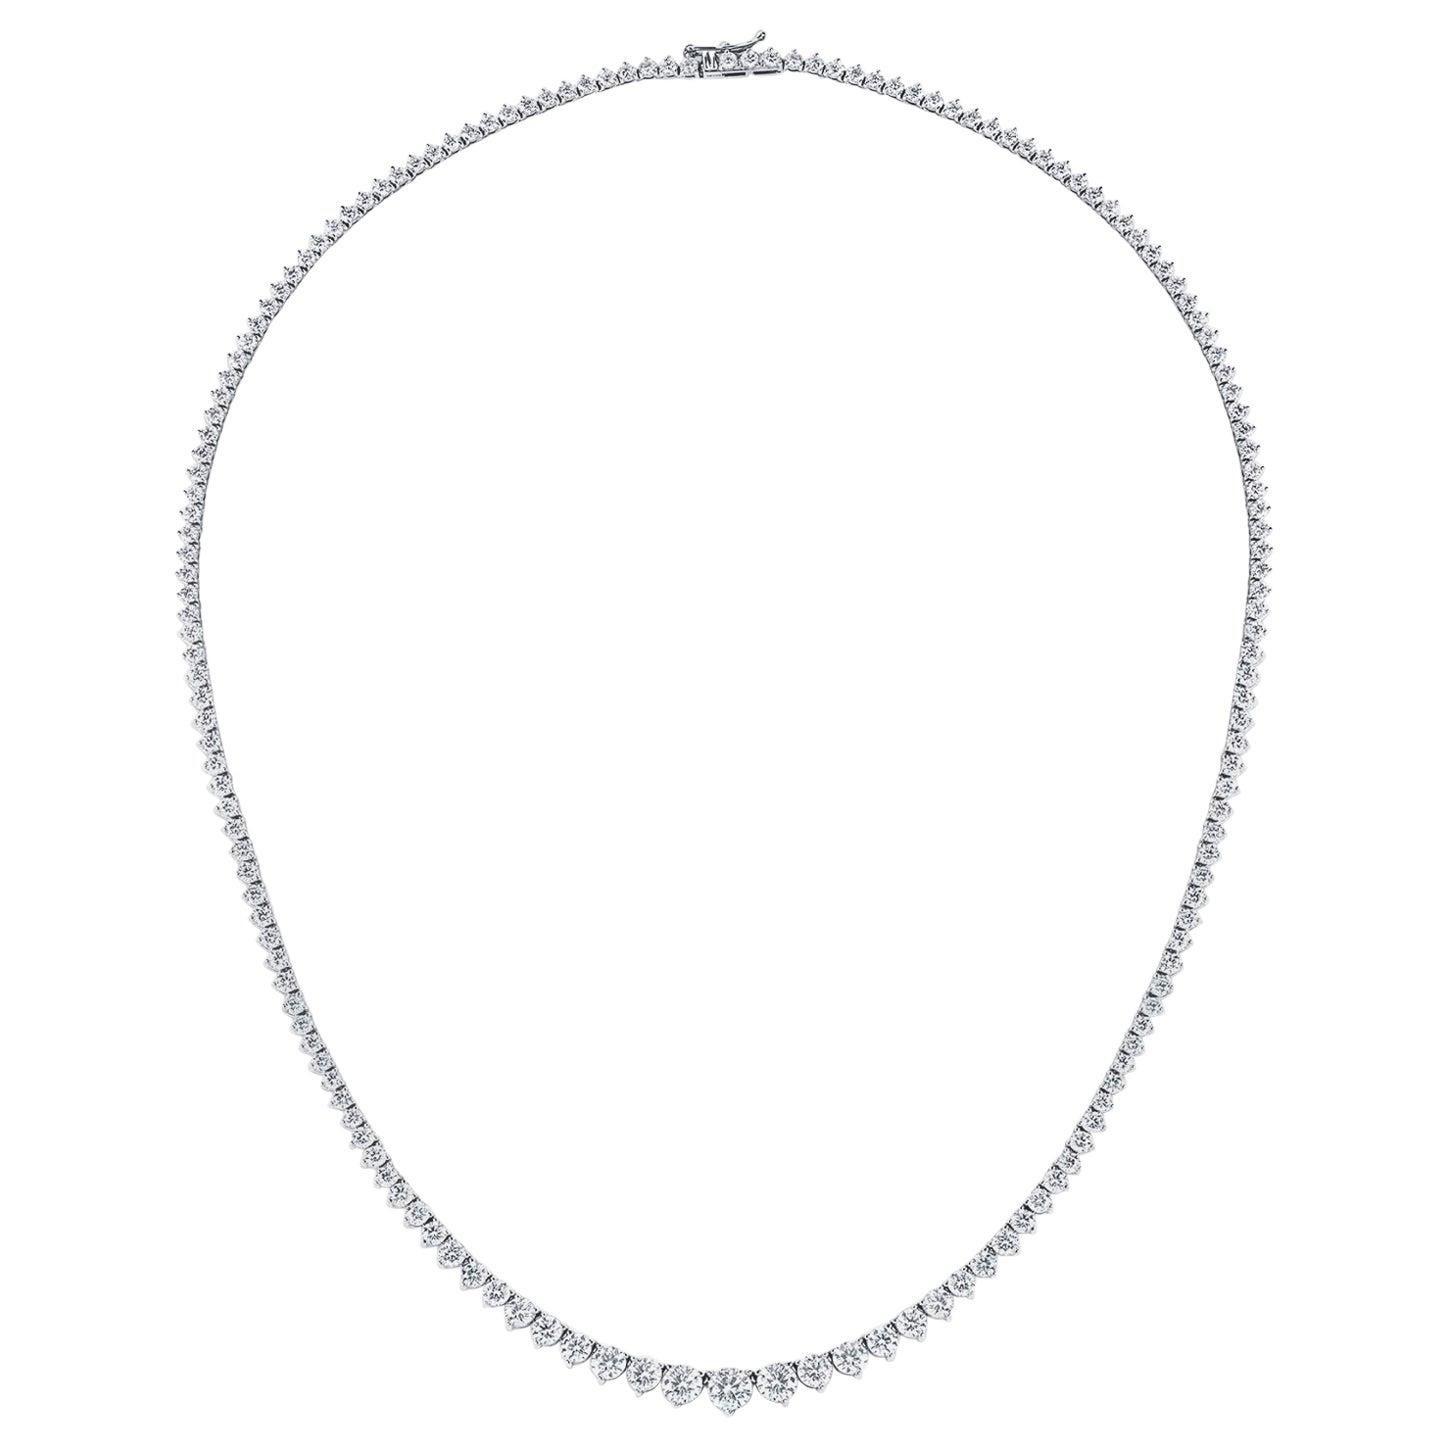 GIA Certified 10.75 Carat Diamond Graduated Riviera Necklace